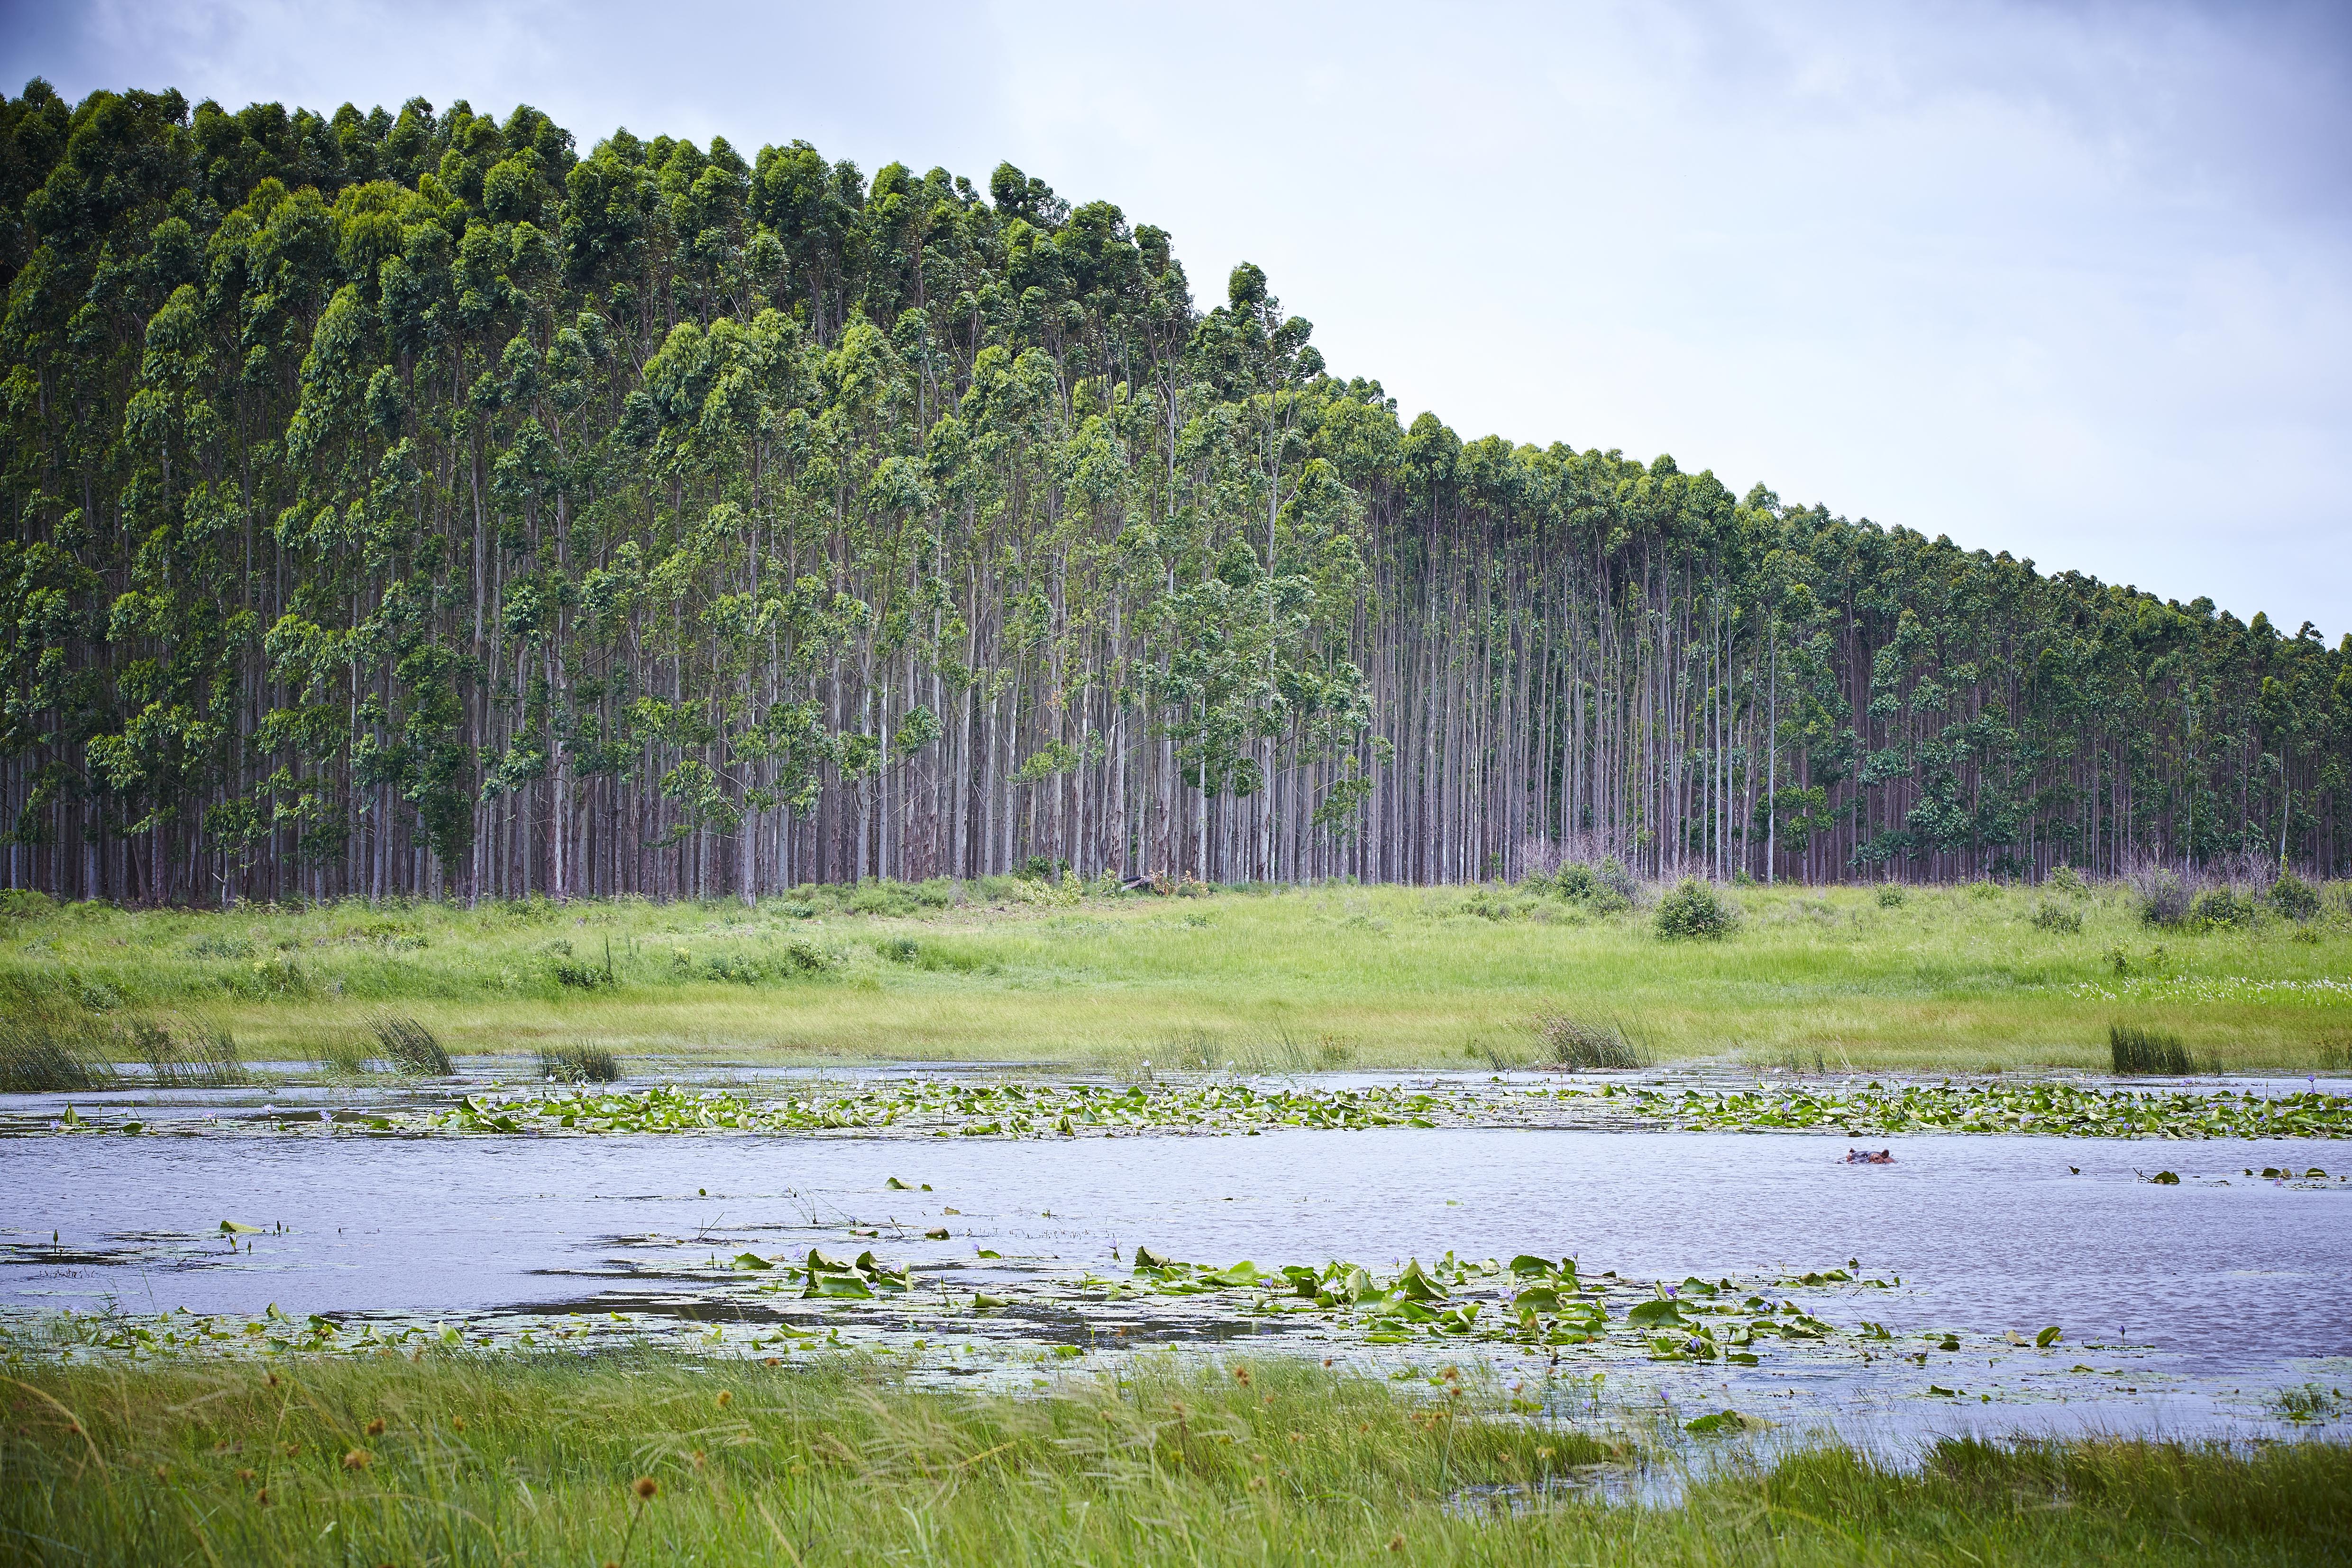 Mondi_Wetland conservation, South Africa